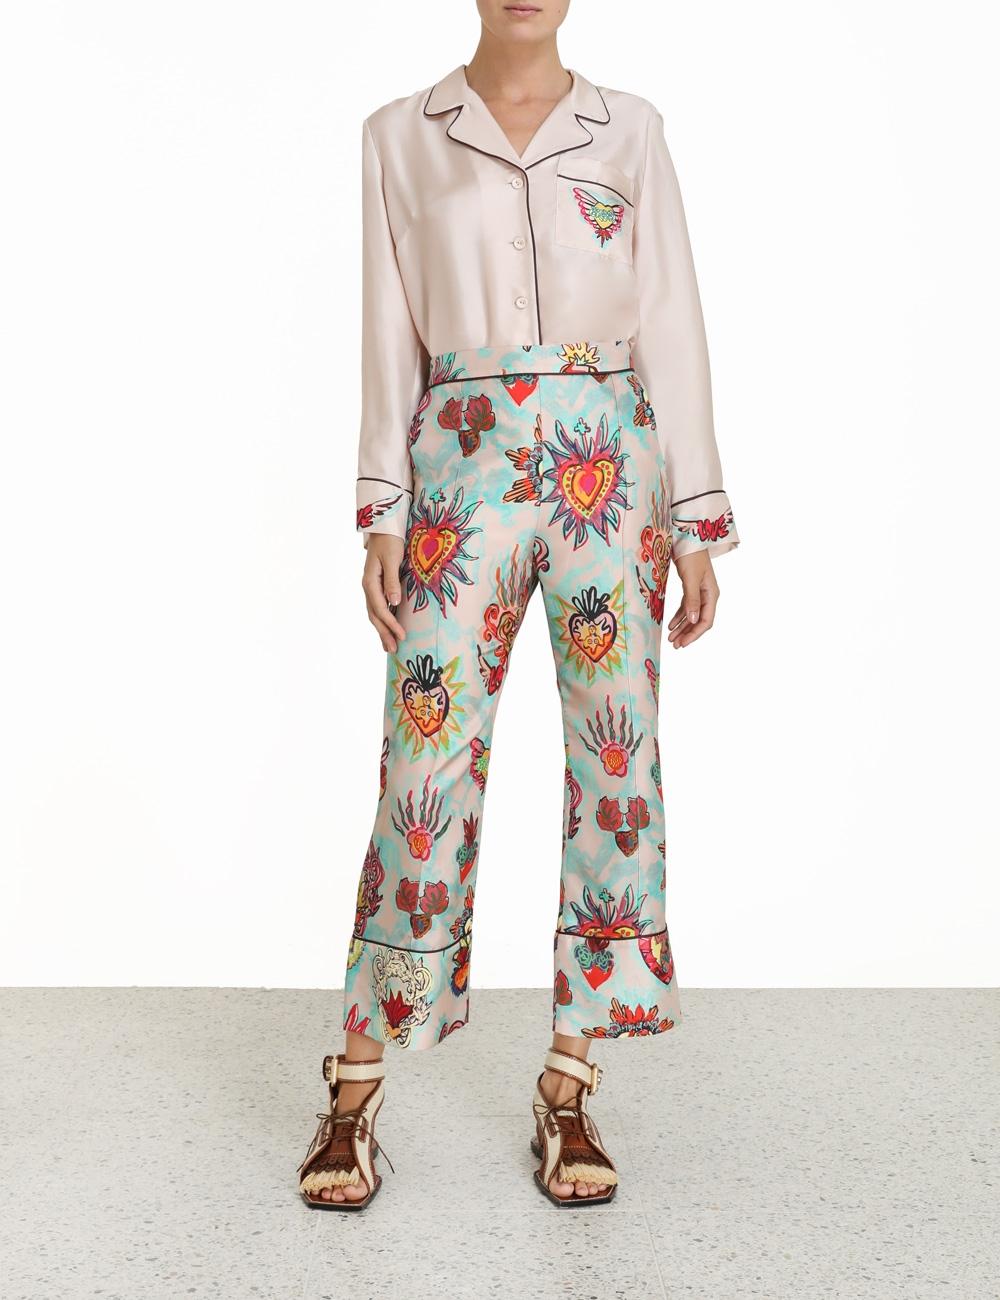 The Lovestruck Pyjama Shirt